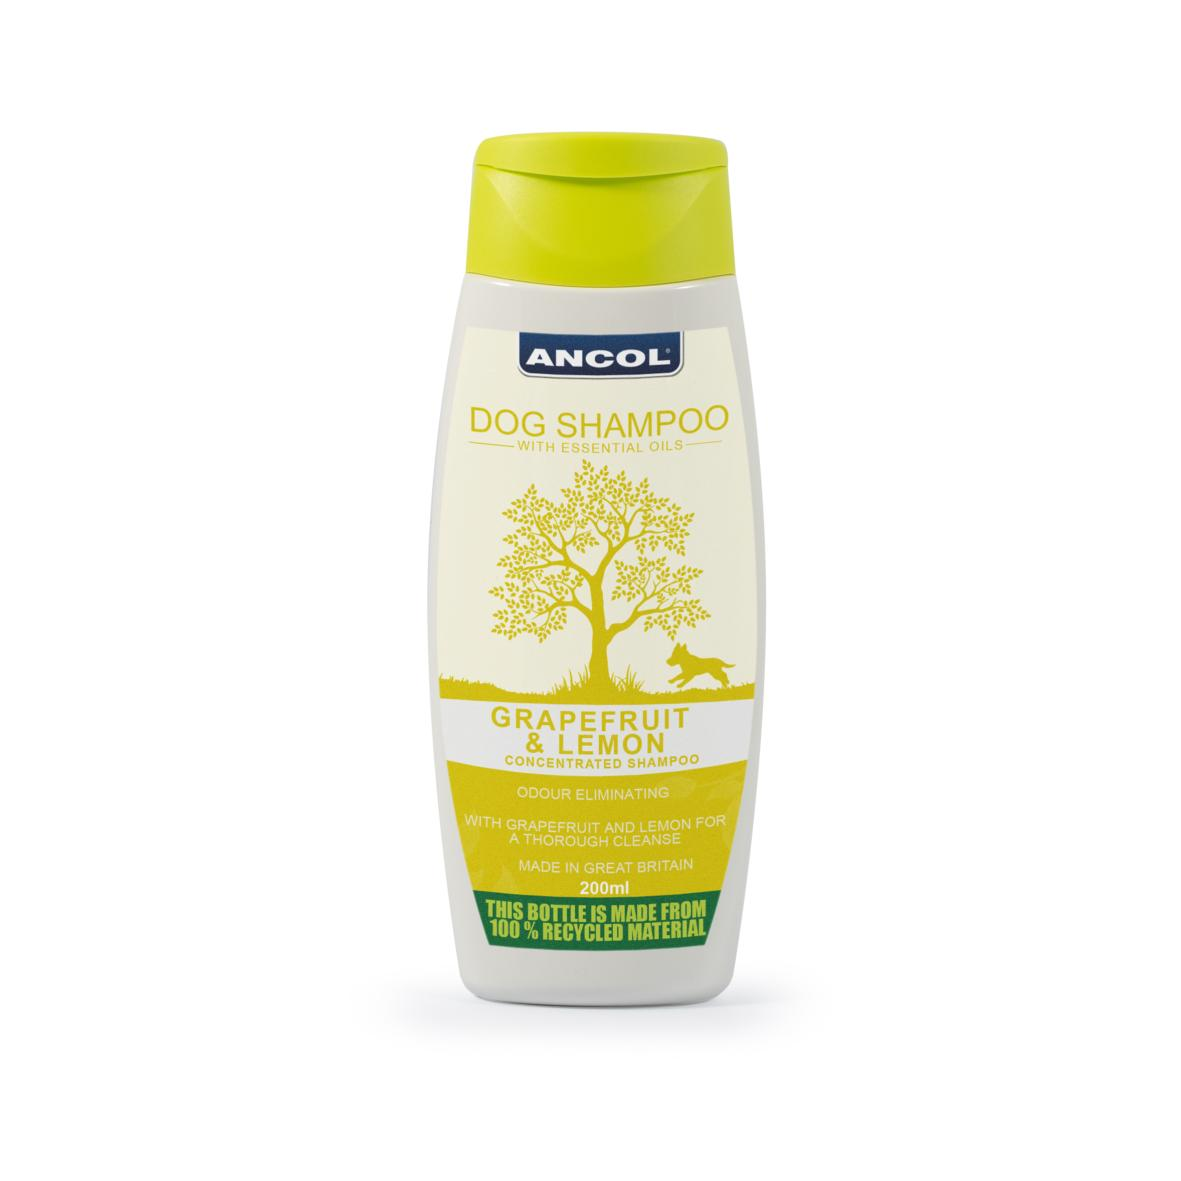 CLEARANCE ANCOL Grapefruit & Lemon Dog Shampoo 200ml